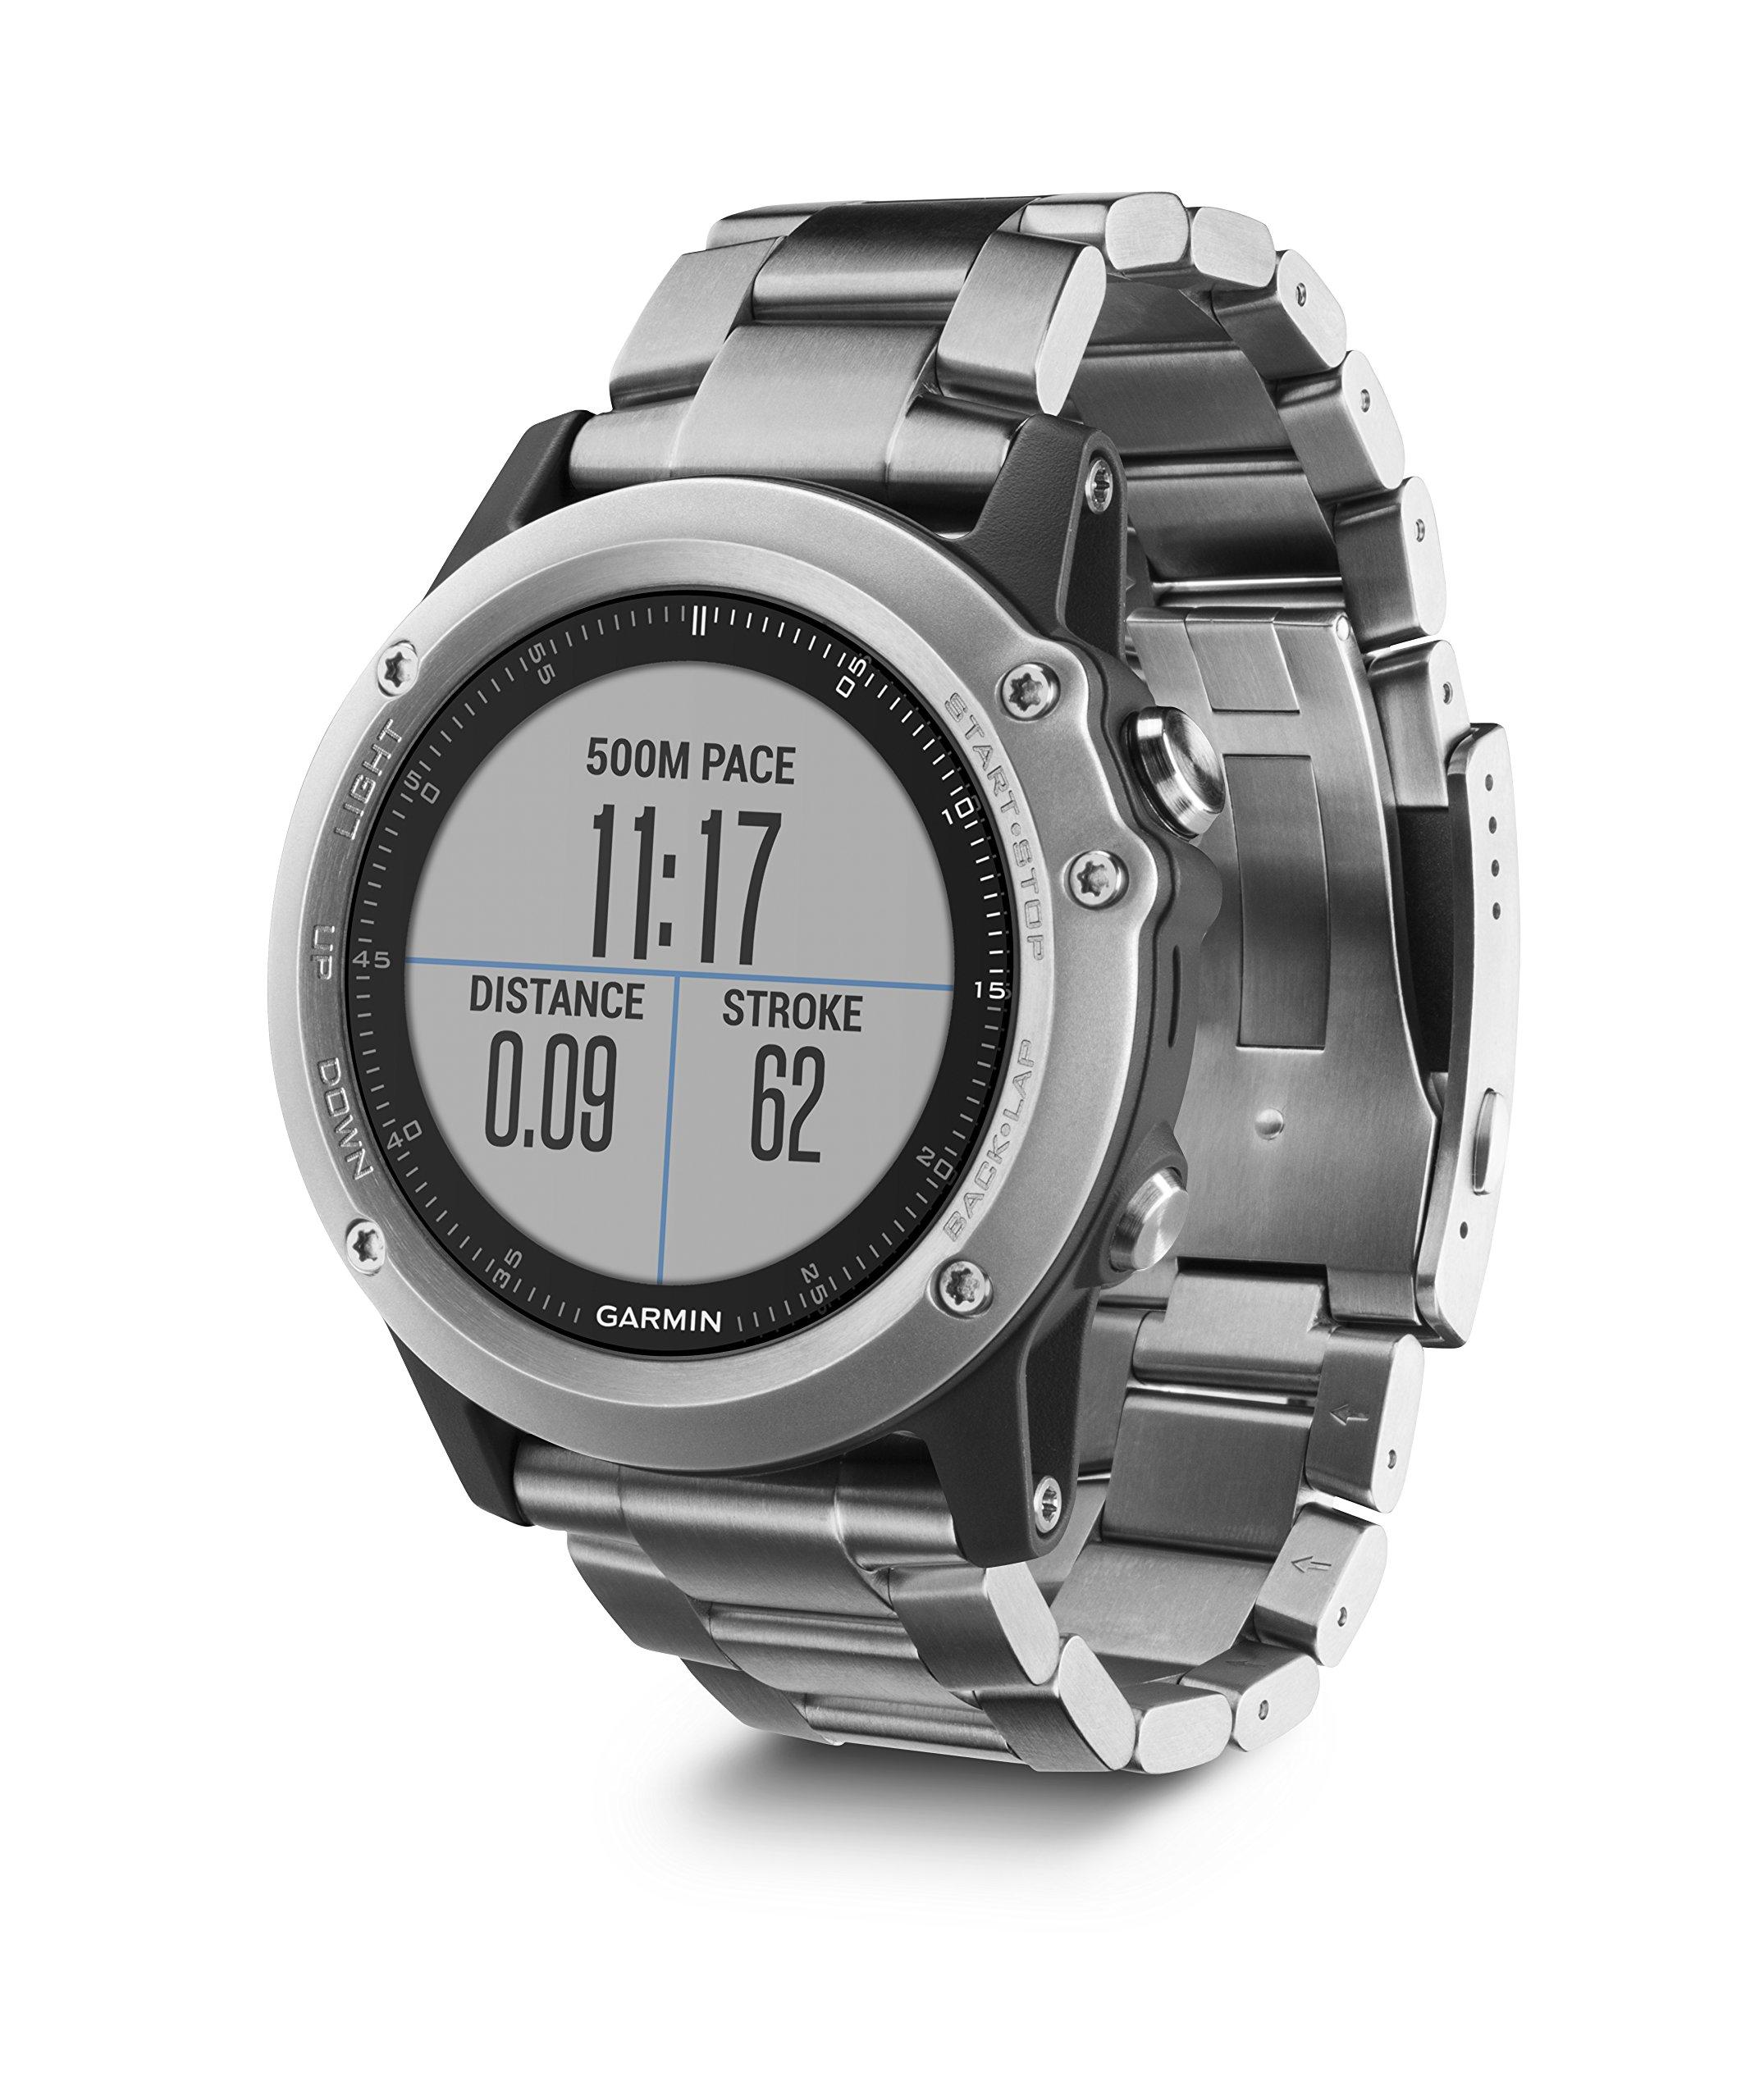 Garmin Fenix 3 HR Smartwatch GPS Multisport, Sensore Cardio al Polso, Display a Colori, Altimetro e Bussola, Nero/Grigio 4 spesavip